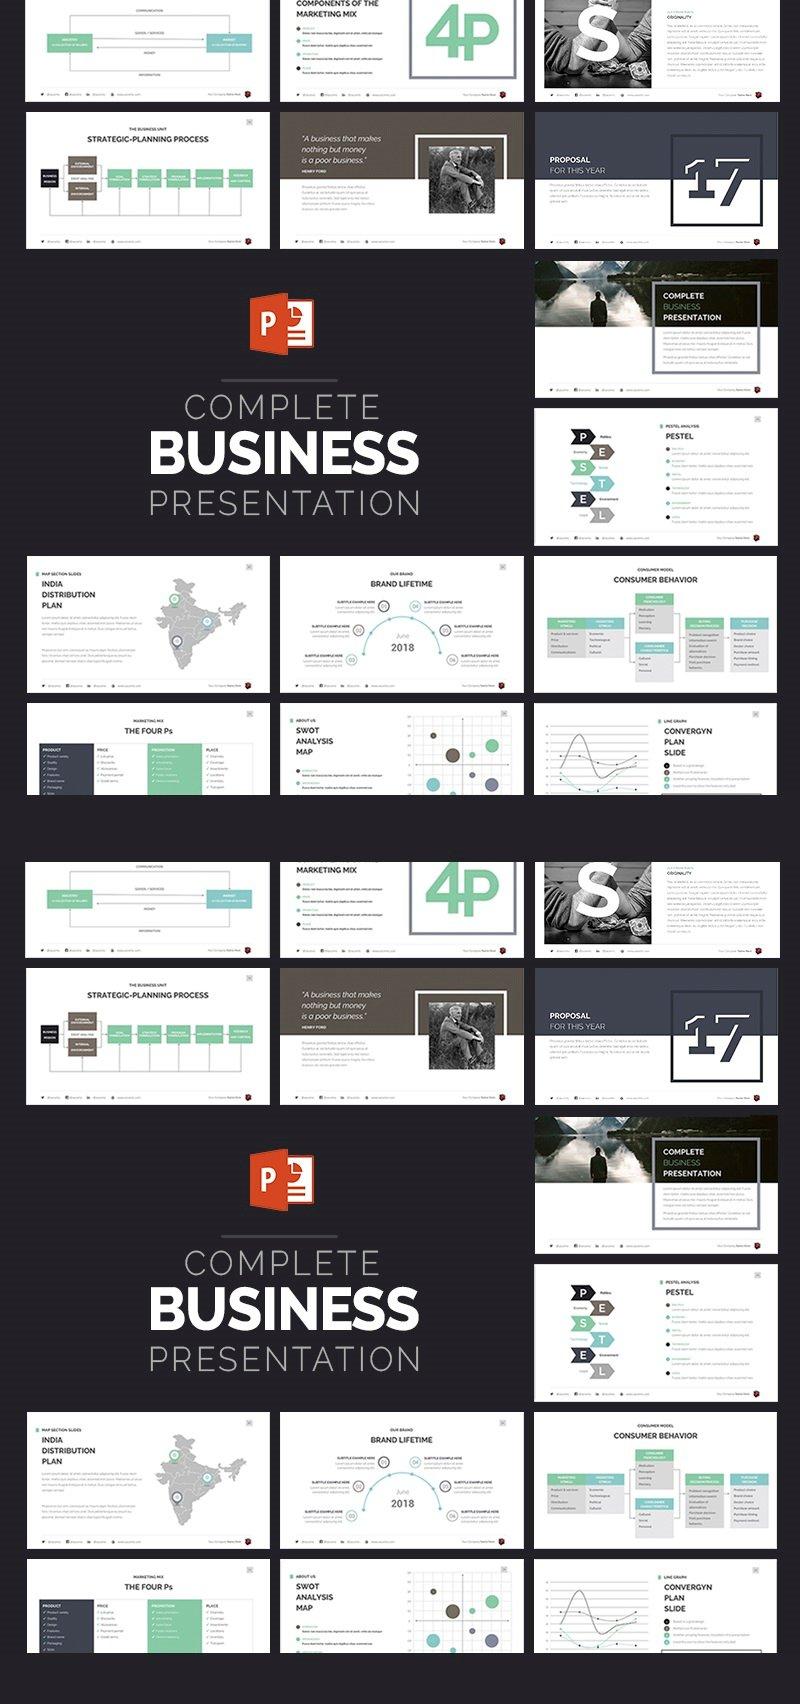 """Complete Business Presentation"" PowerPoint 模板 #63510 - 截图"